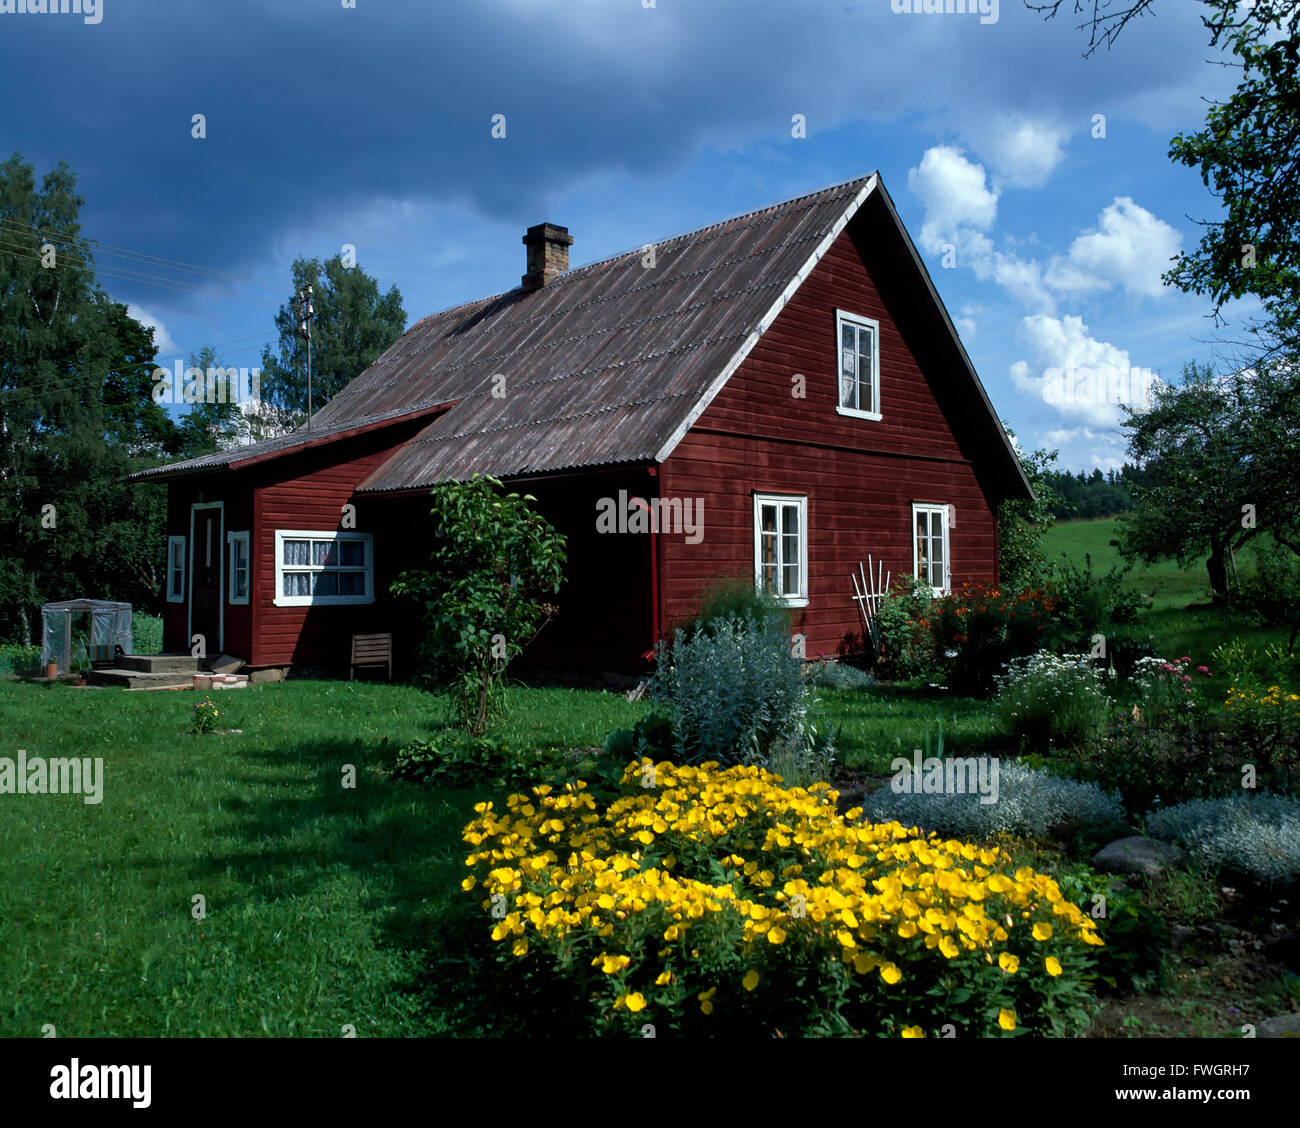 House in Haanjamaa Naturpark, Estonia, Europe - Stock Image